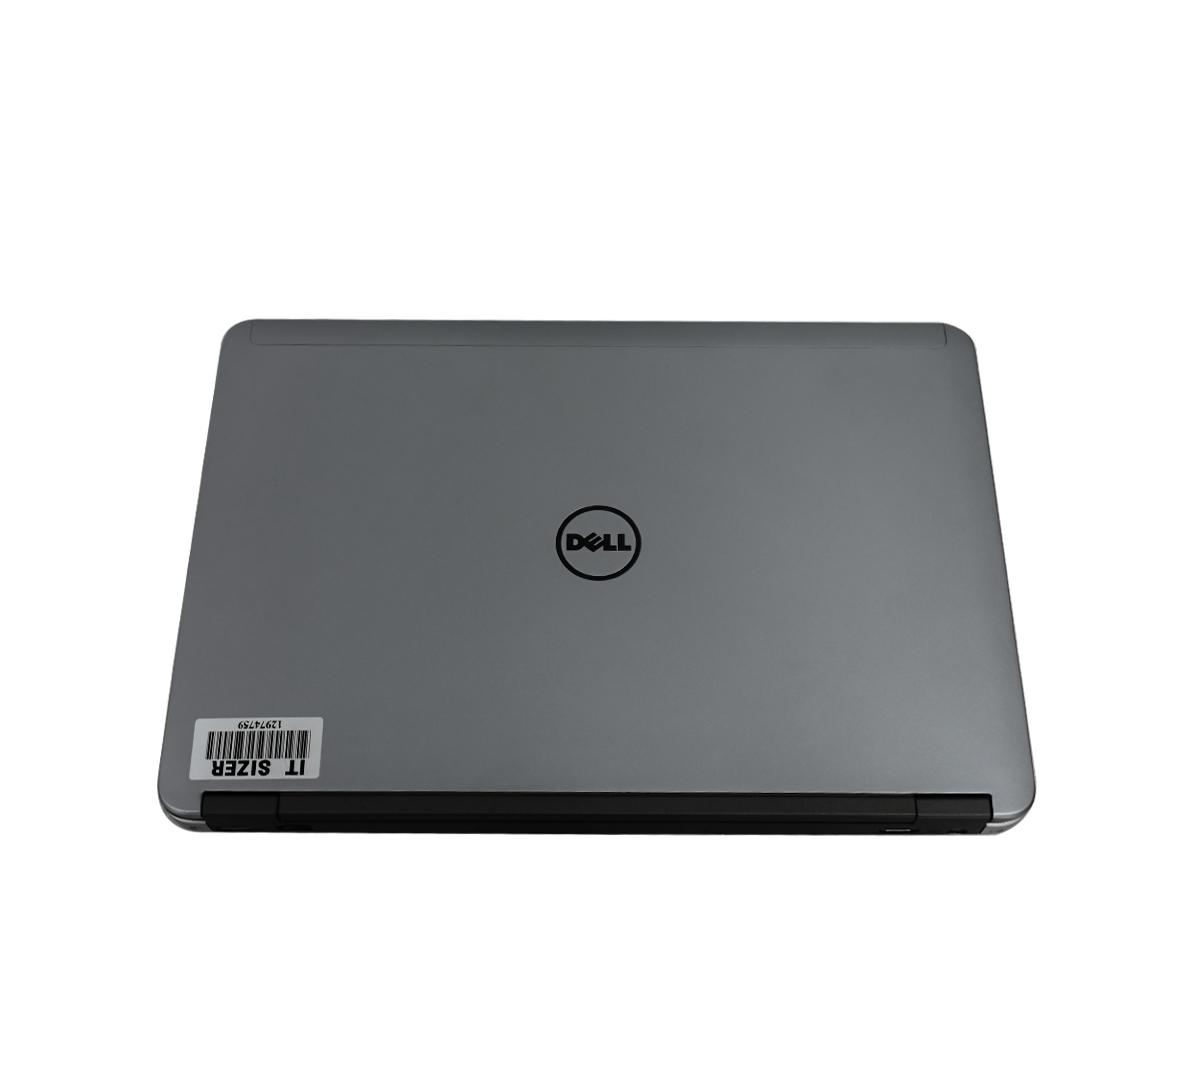 Dell Latitude E6440 Business Laptop, Intel Core i5 4th-Gen CPU, 8GB DDR3L SODIMM RAM, 256GB SSD, 14 inch Display, Windows 10 Pro (Refurbished)